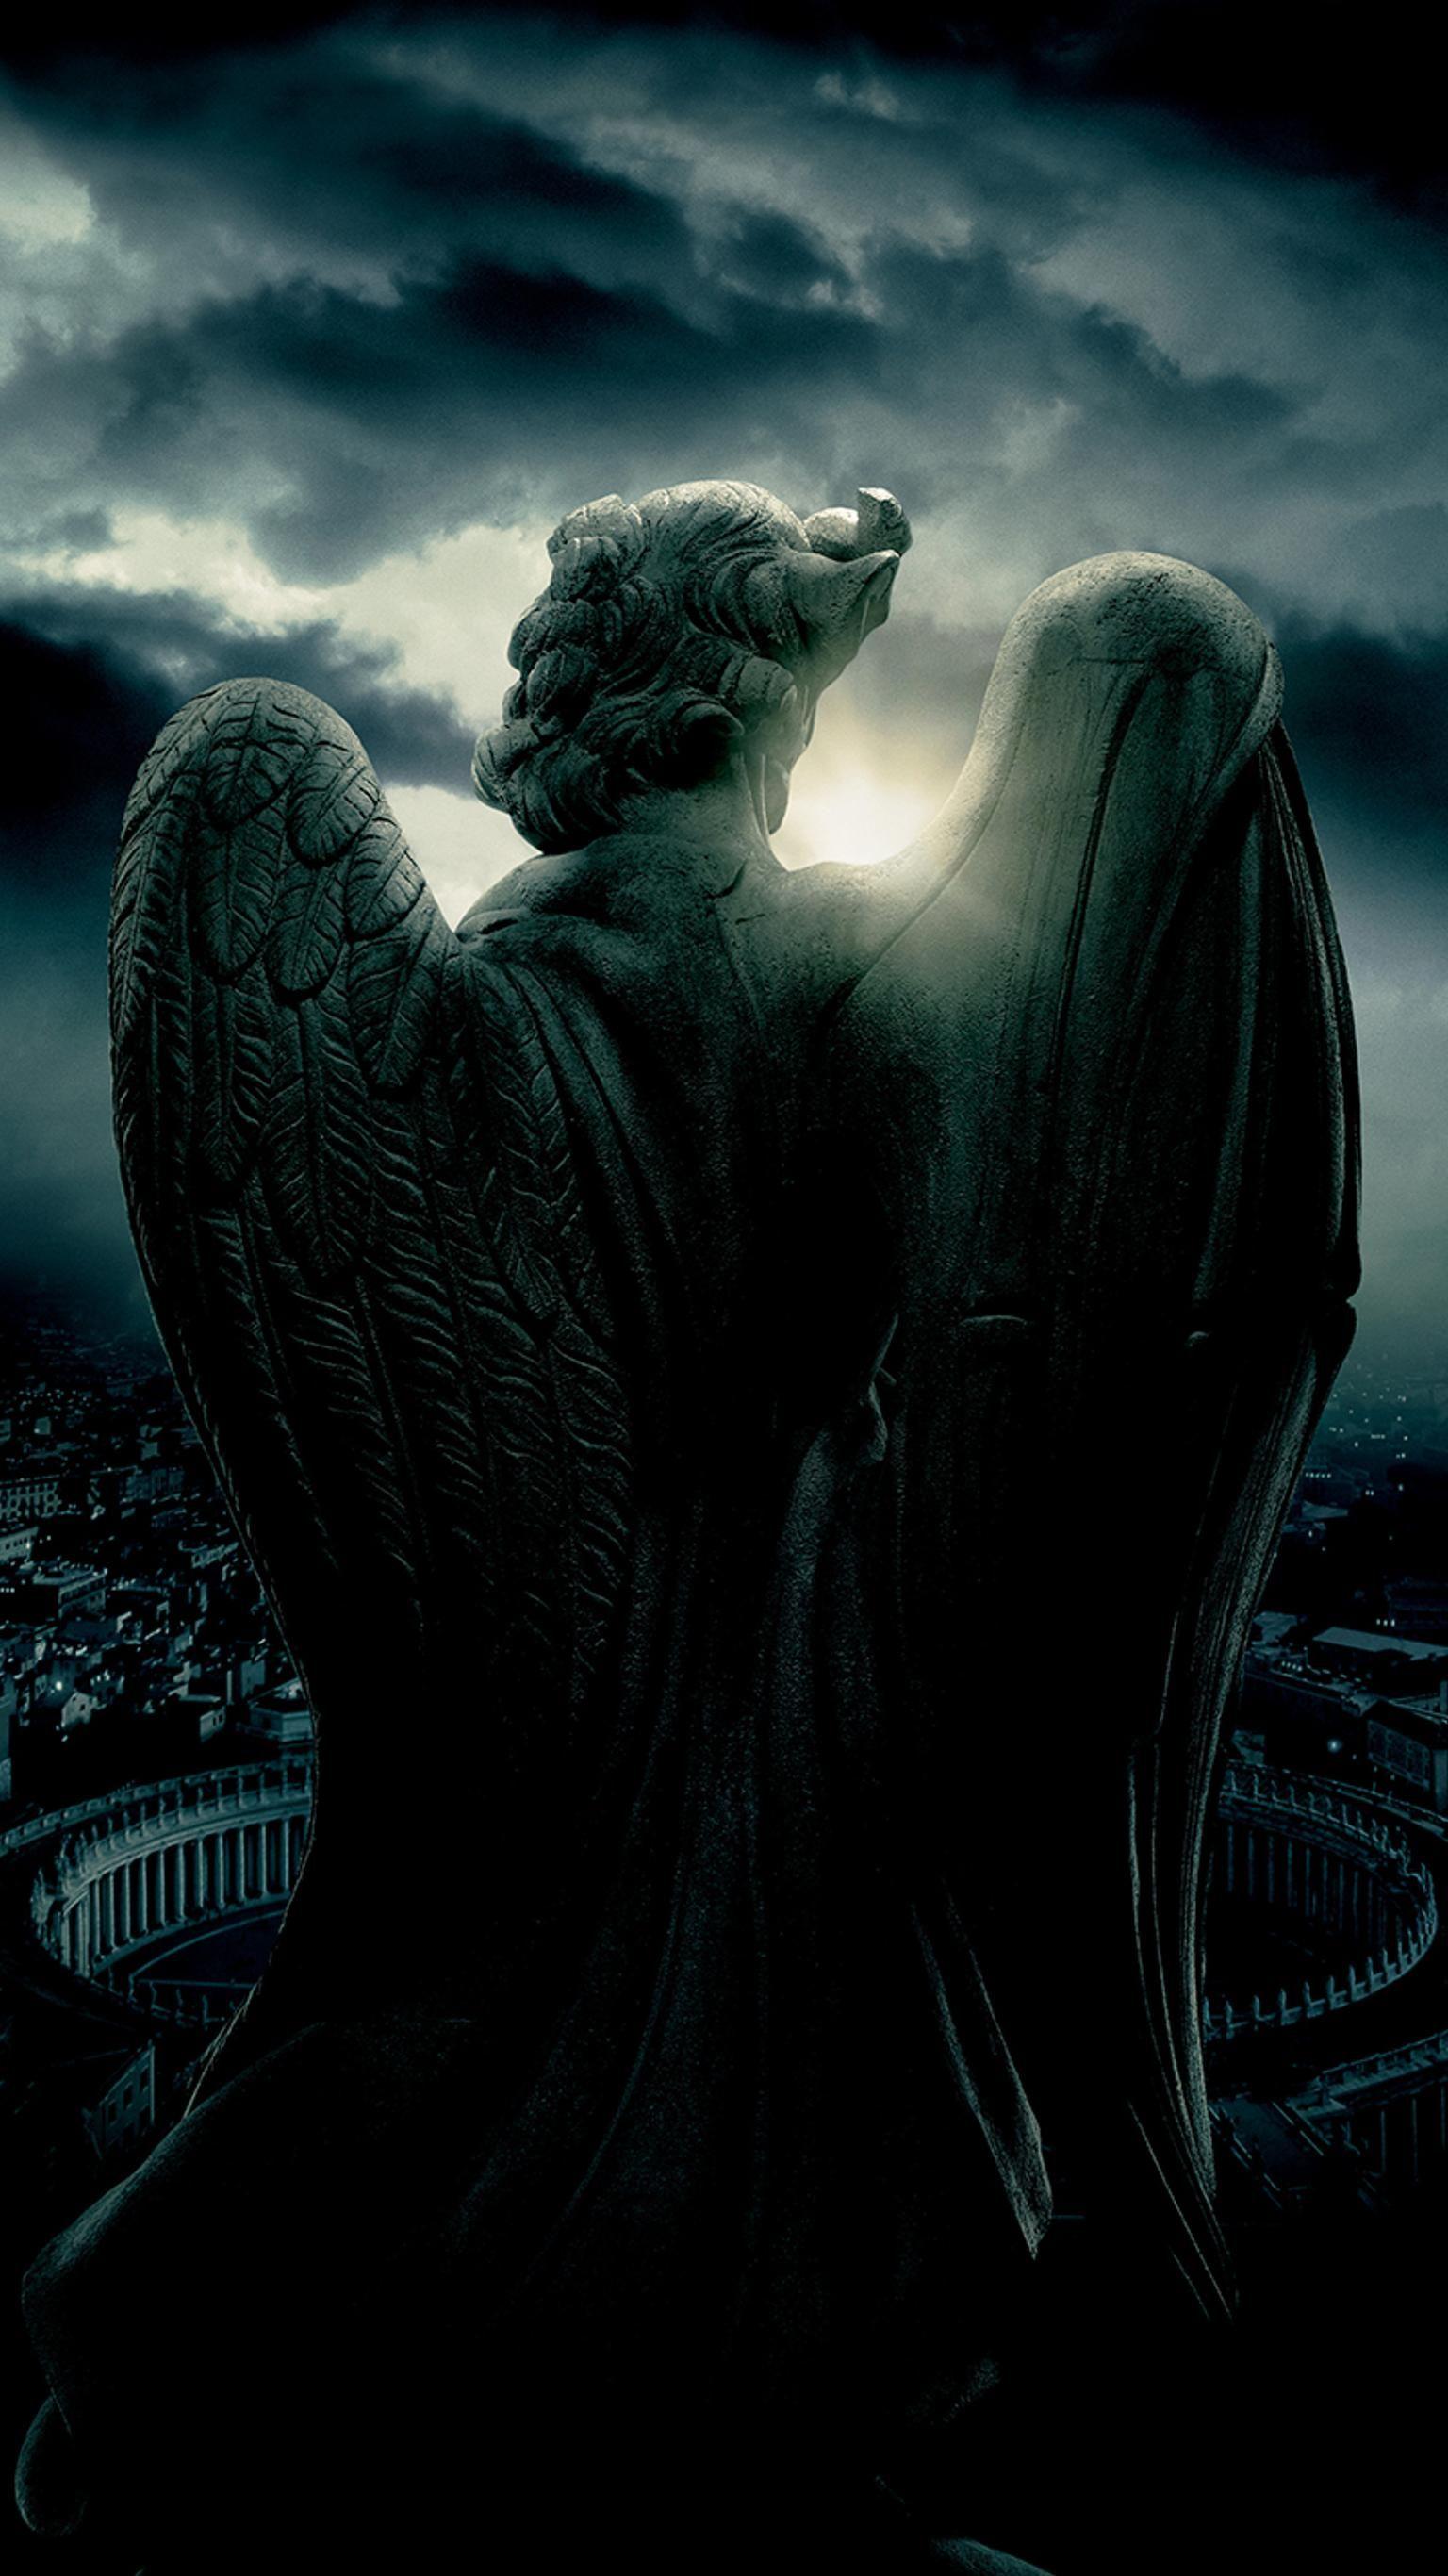 Angels Demons 2009 Phone Wallpaper Moviemania In 2020 Angels And Demons Movie Angels And Demons Streaming Movies